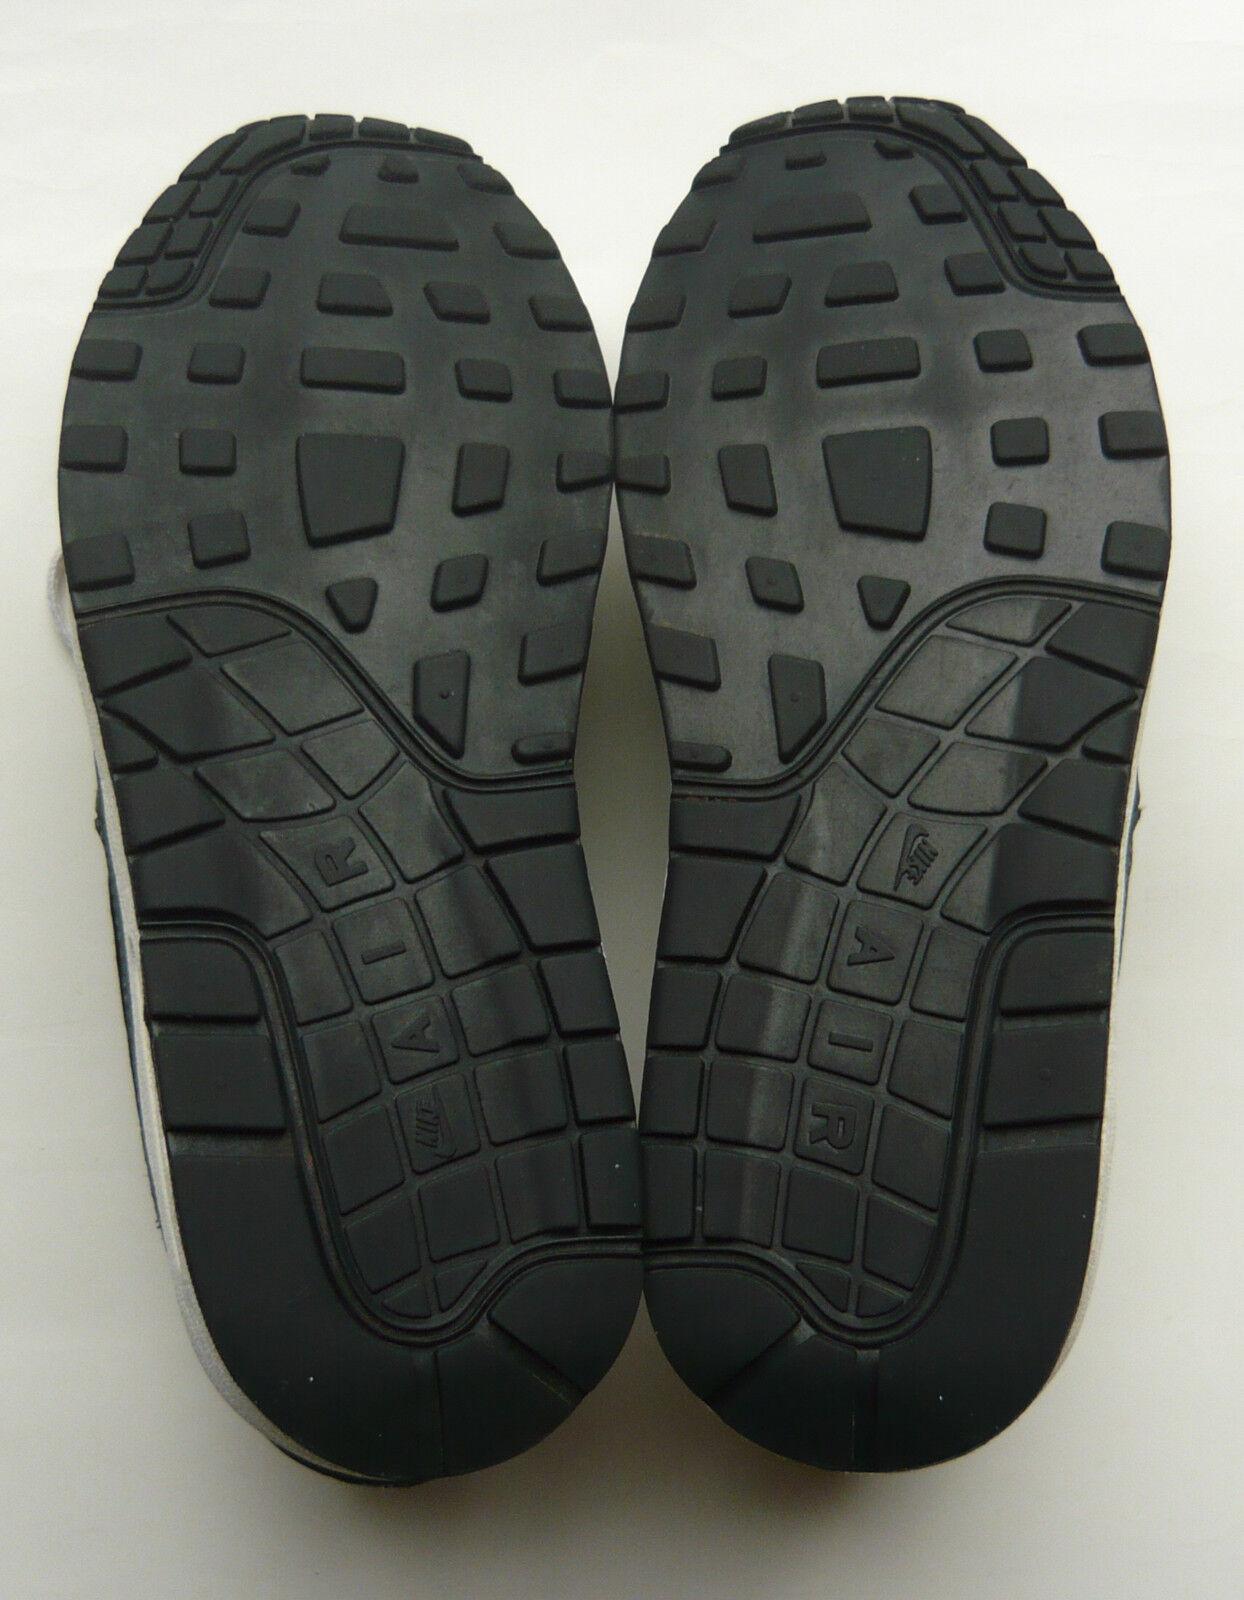 Damen Sneaker Nike Grau Air Max 555766-110 Gr.38,5 Grau Nike 69635c